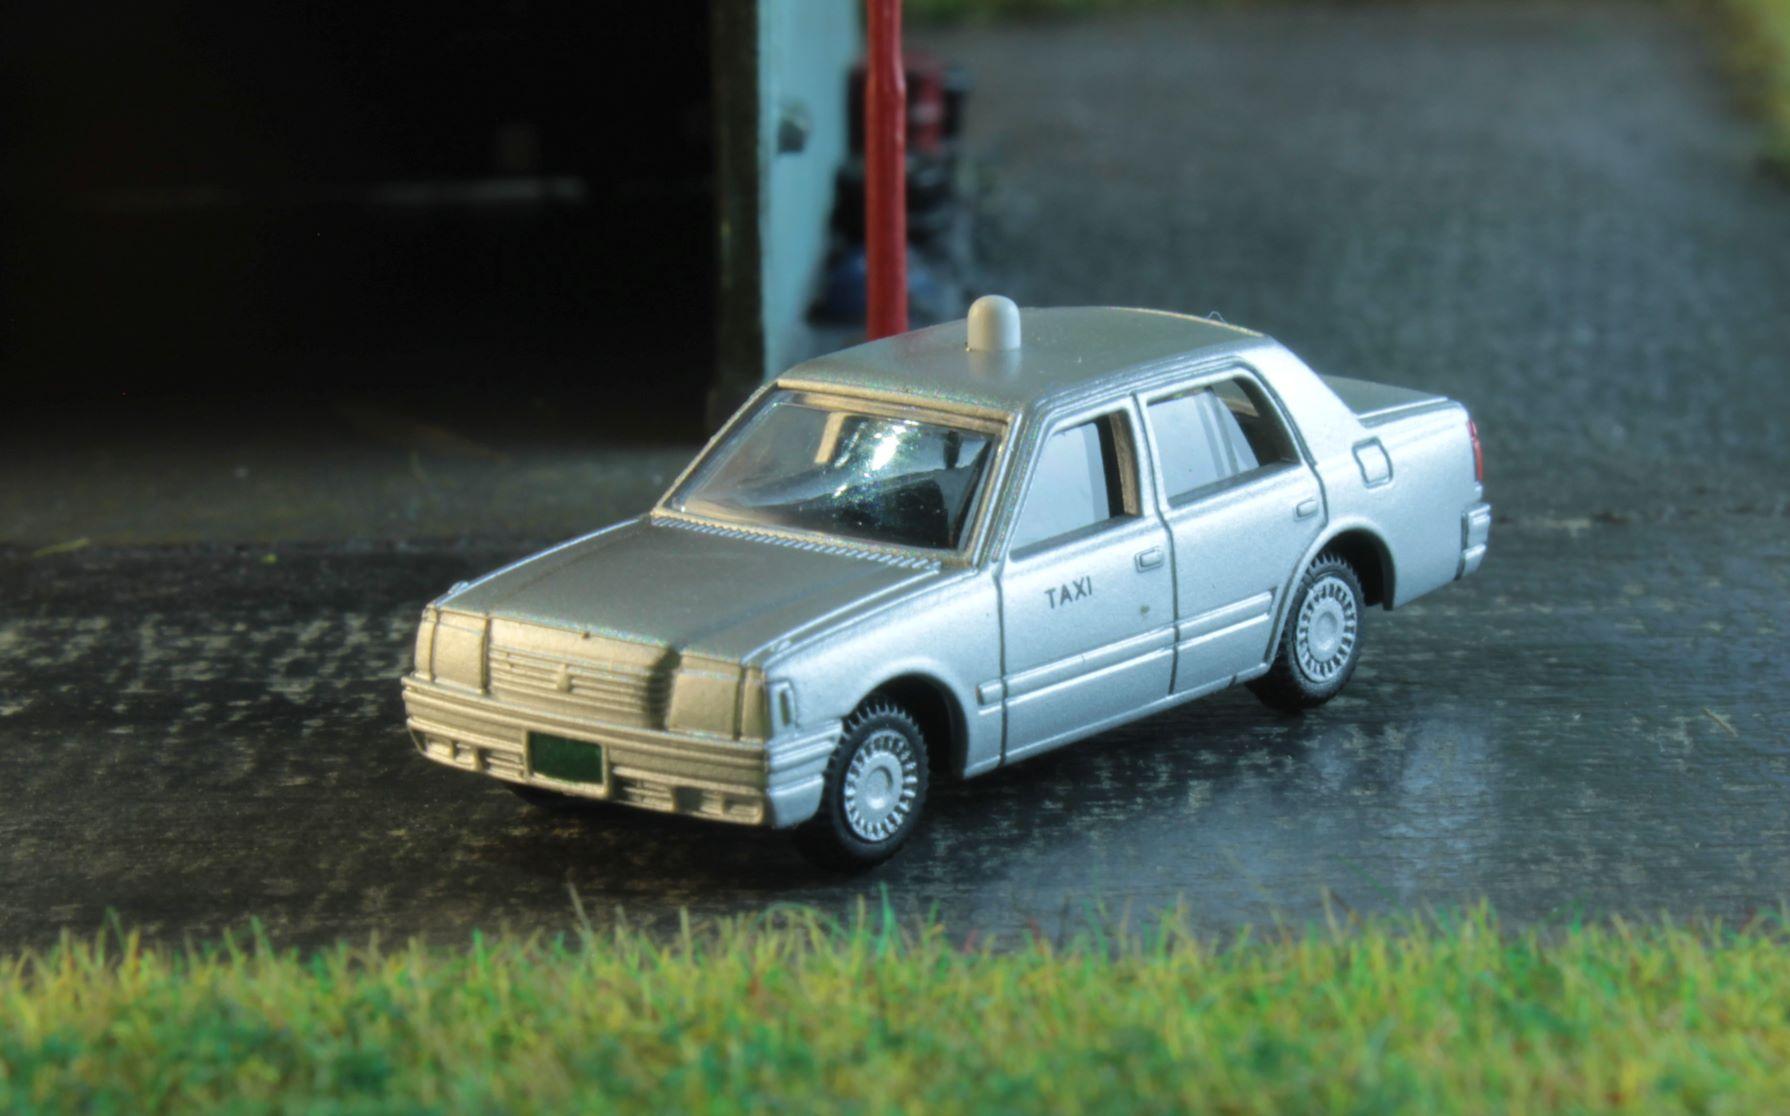 Taxi Nissan 1 .JPG